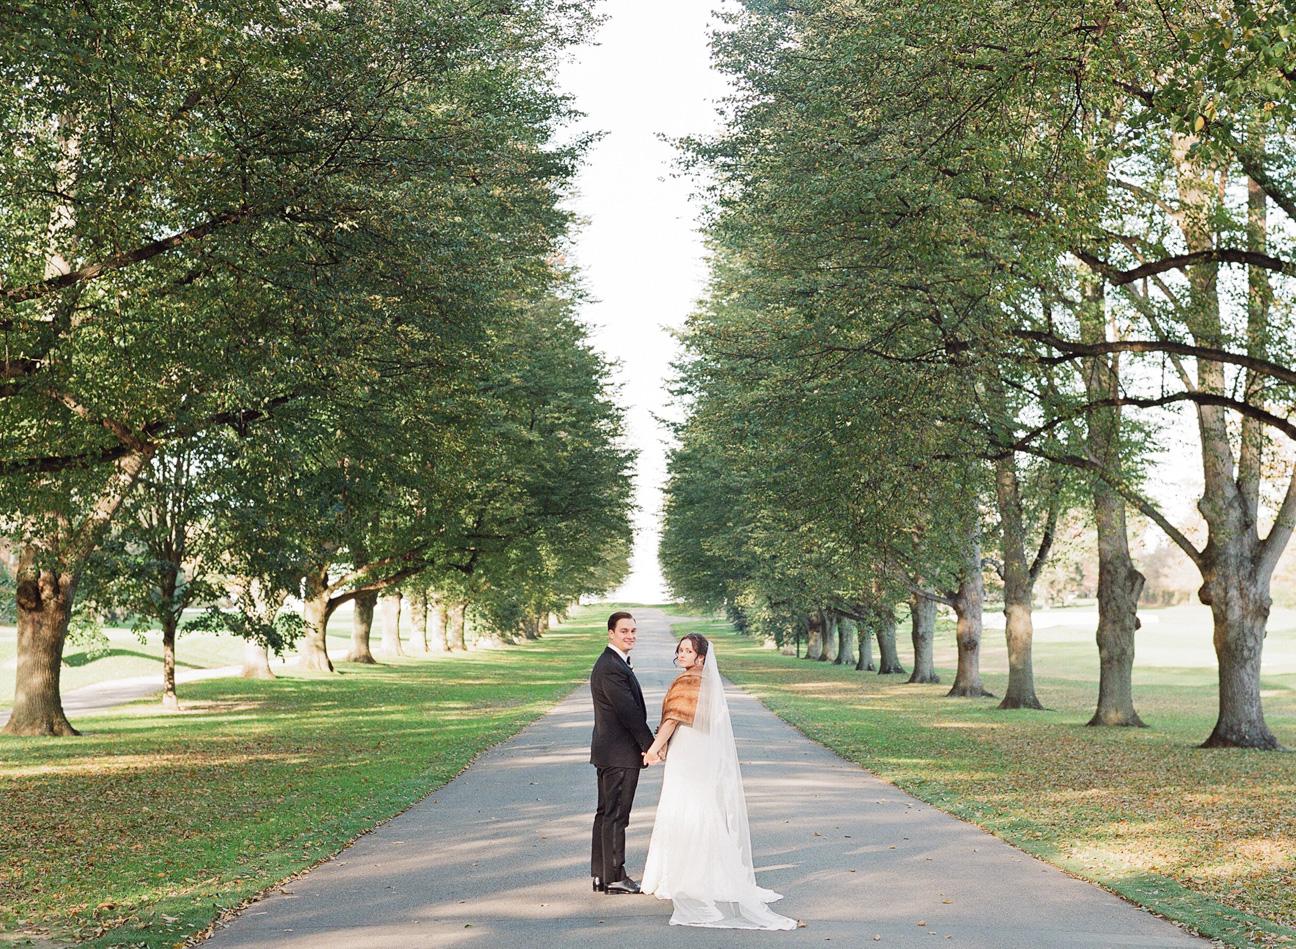 KarenHillPhotography-Forlines-Wedding-0246.jpg